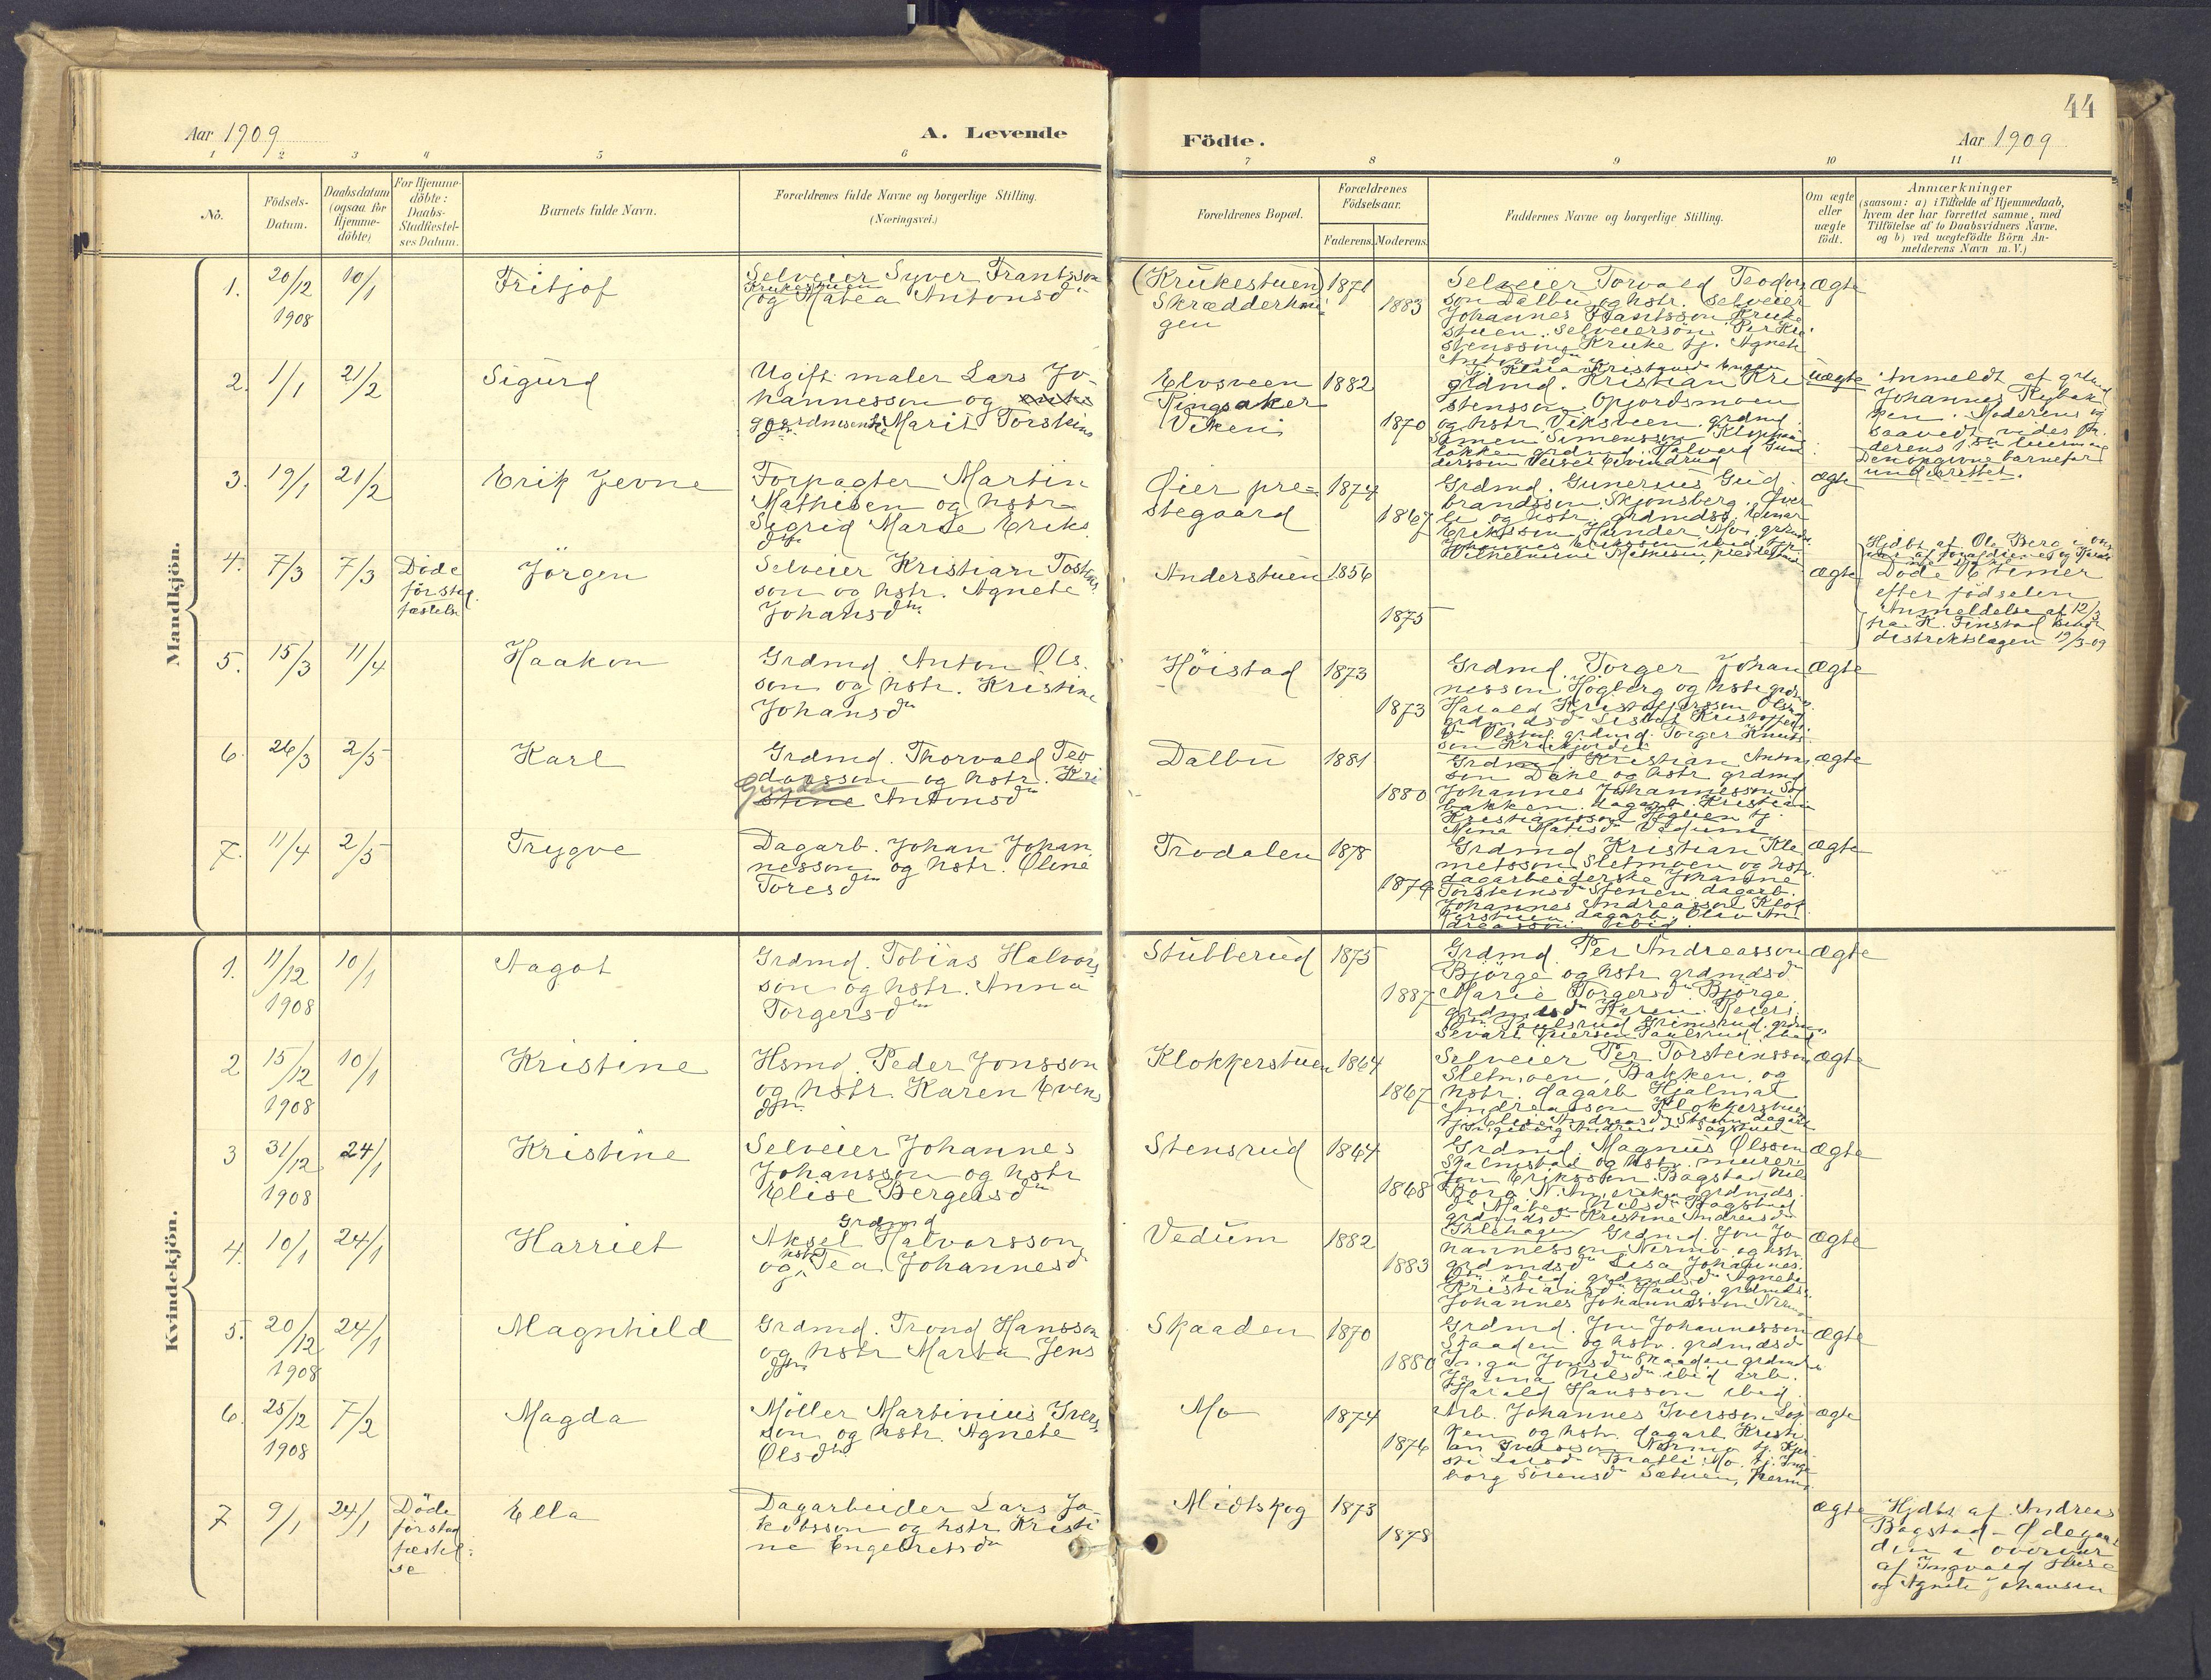 SAH, Øyer prestekontor, Ministerialbok nr. 12, 1897-1920, s. 44